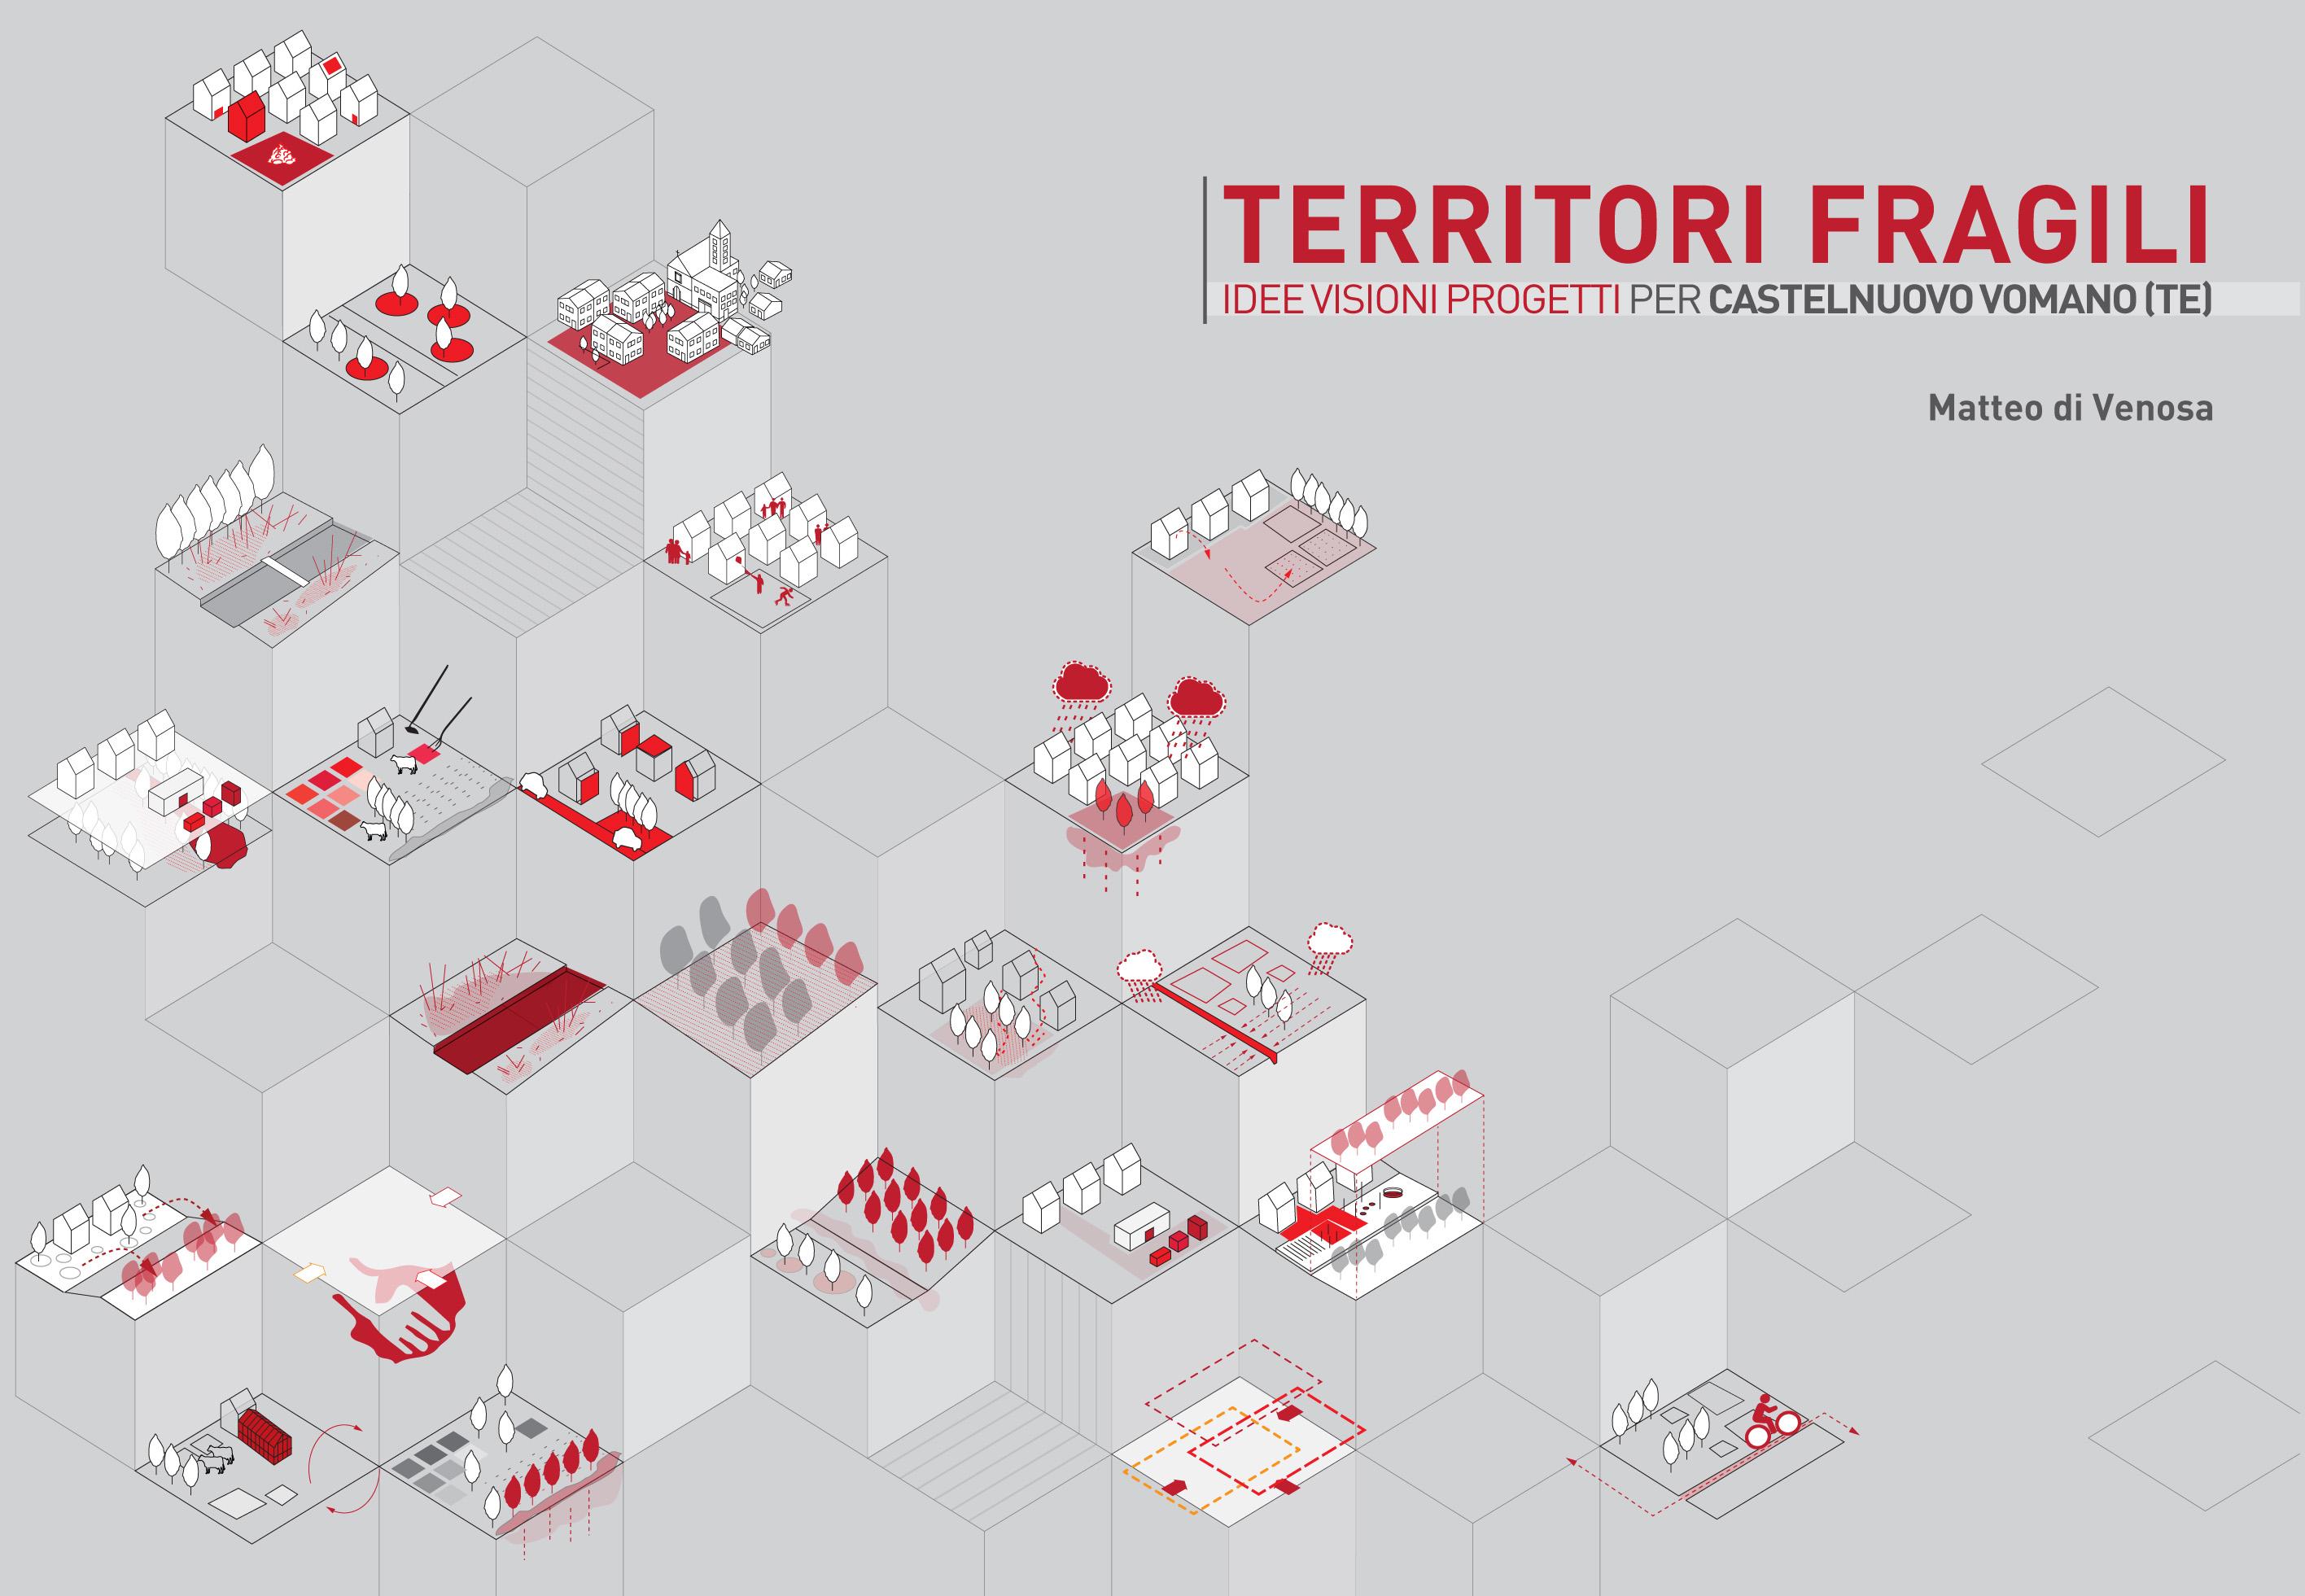 Territori Fragili